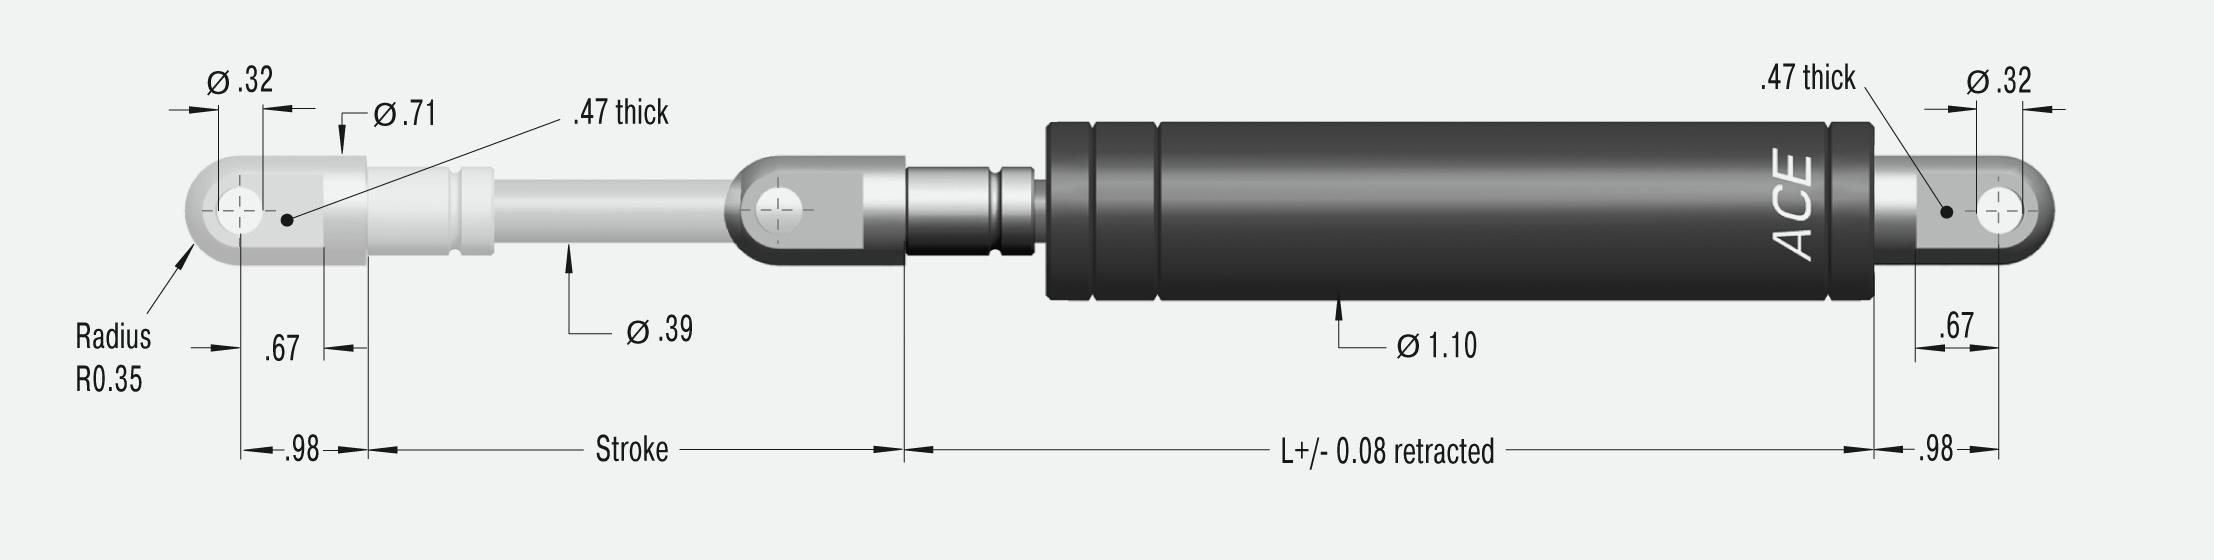 GZ-28-100